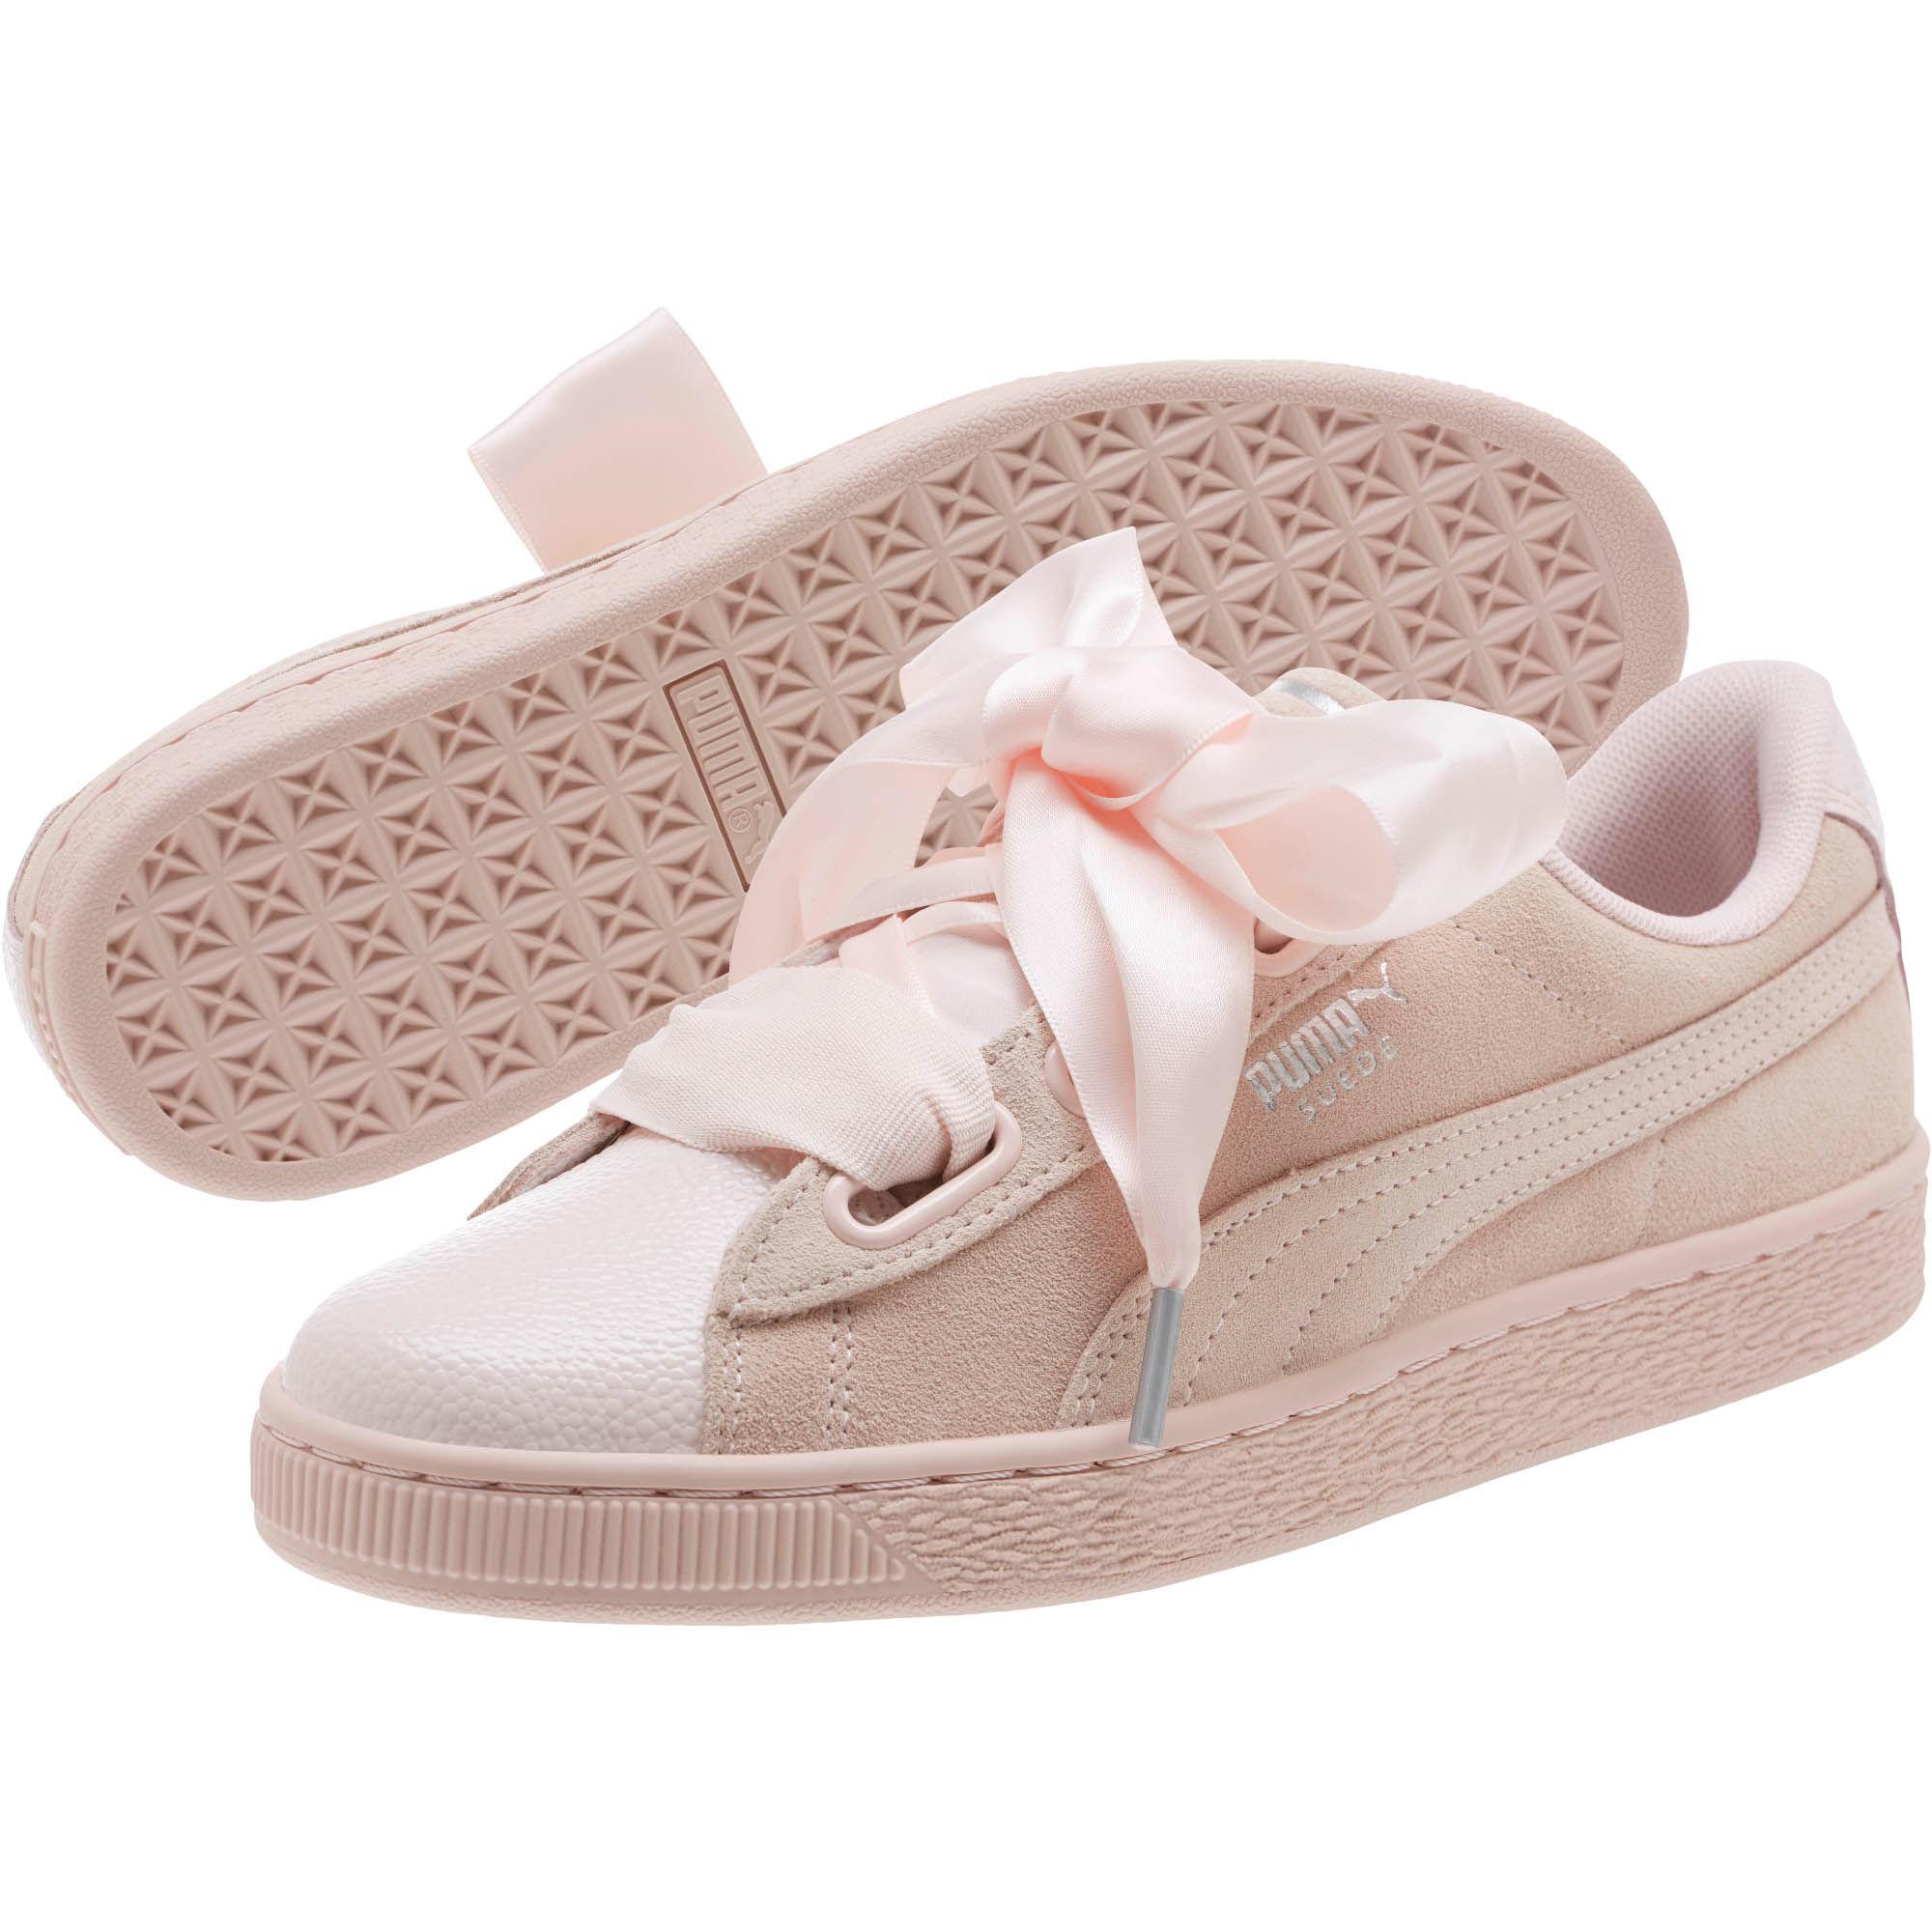 Lyst - PUMA Suede Heart Bubble Women s Sneakers in Pink 7c0dfb00f9